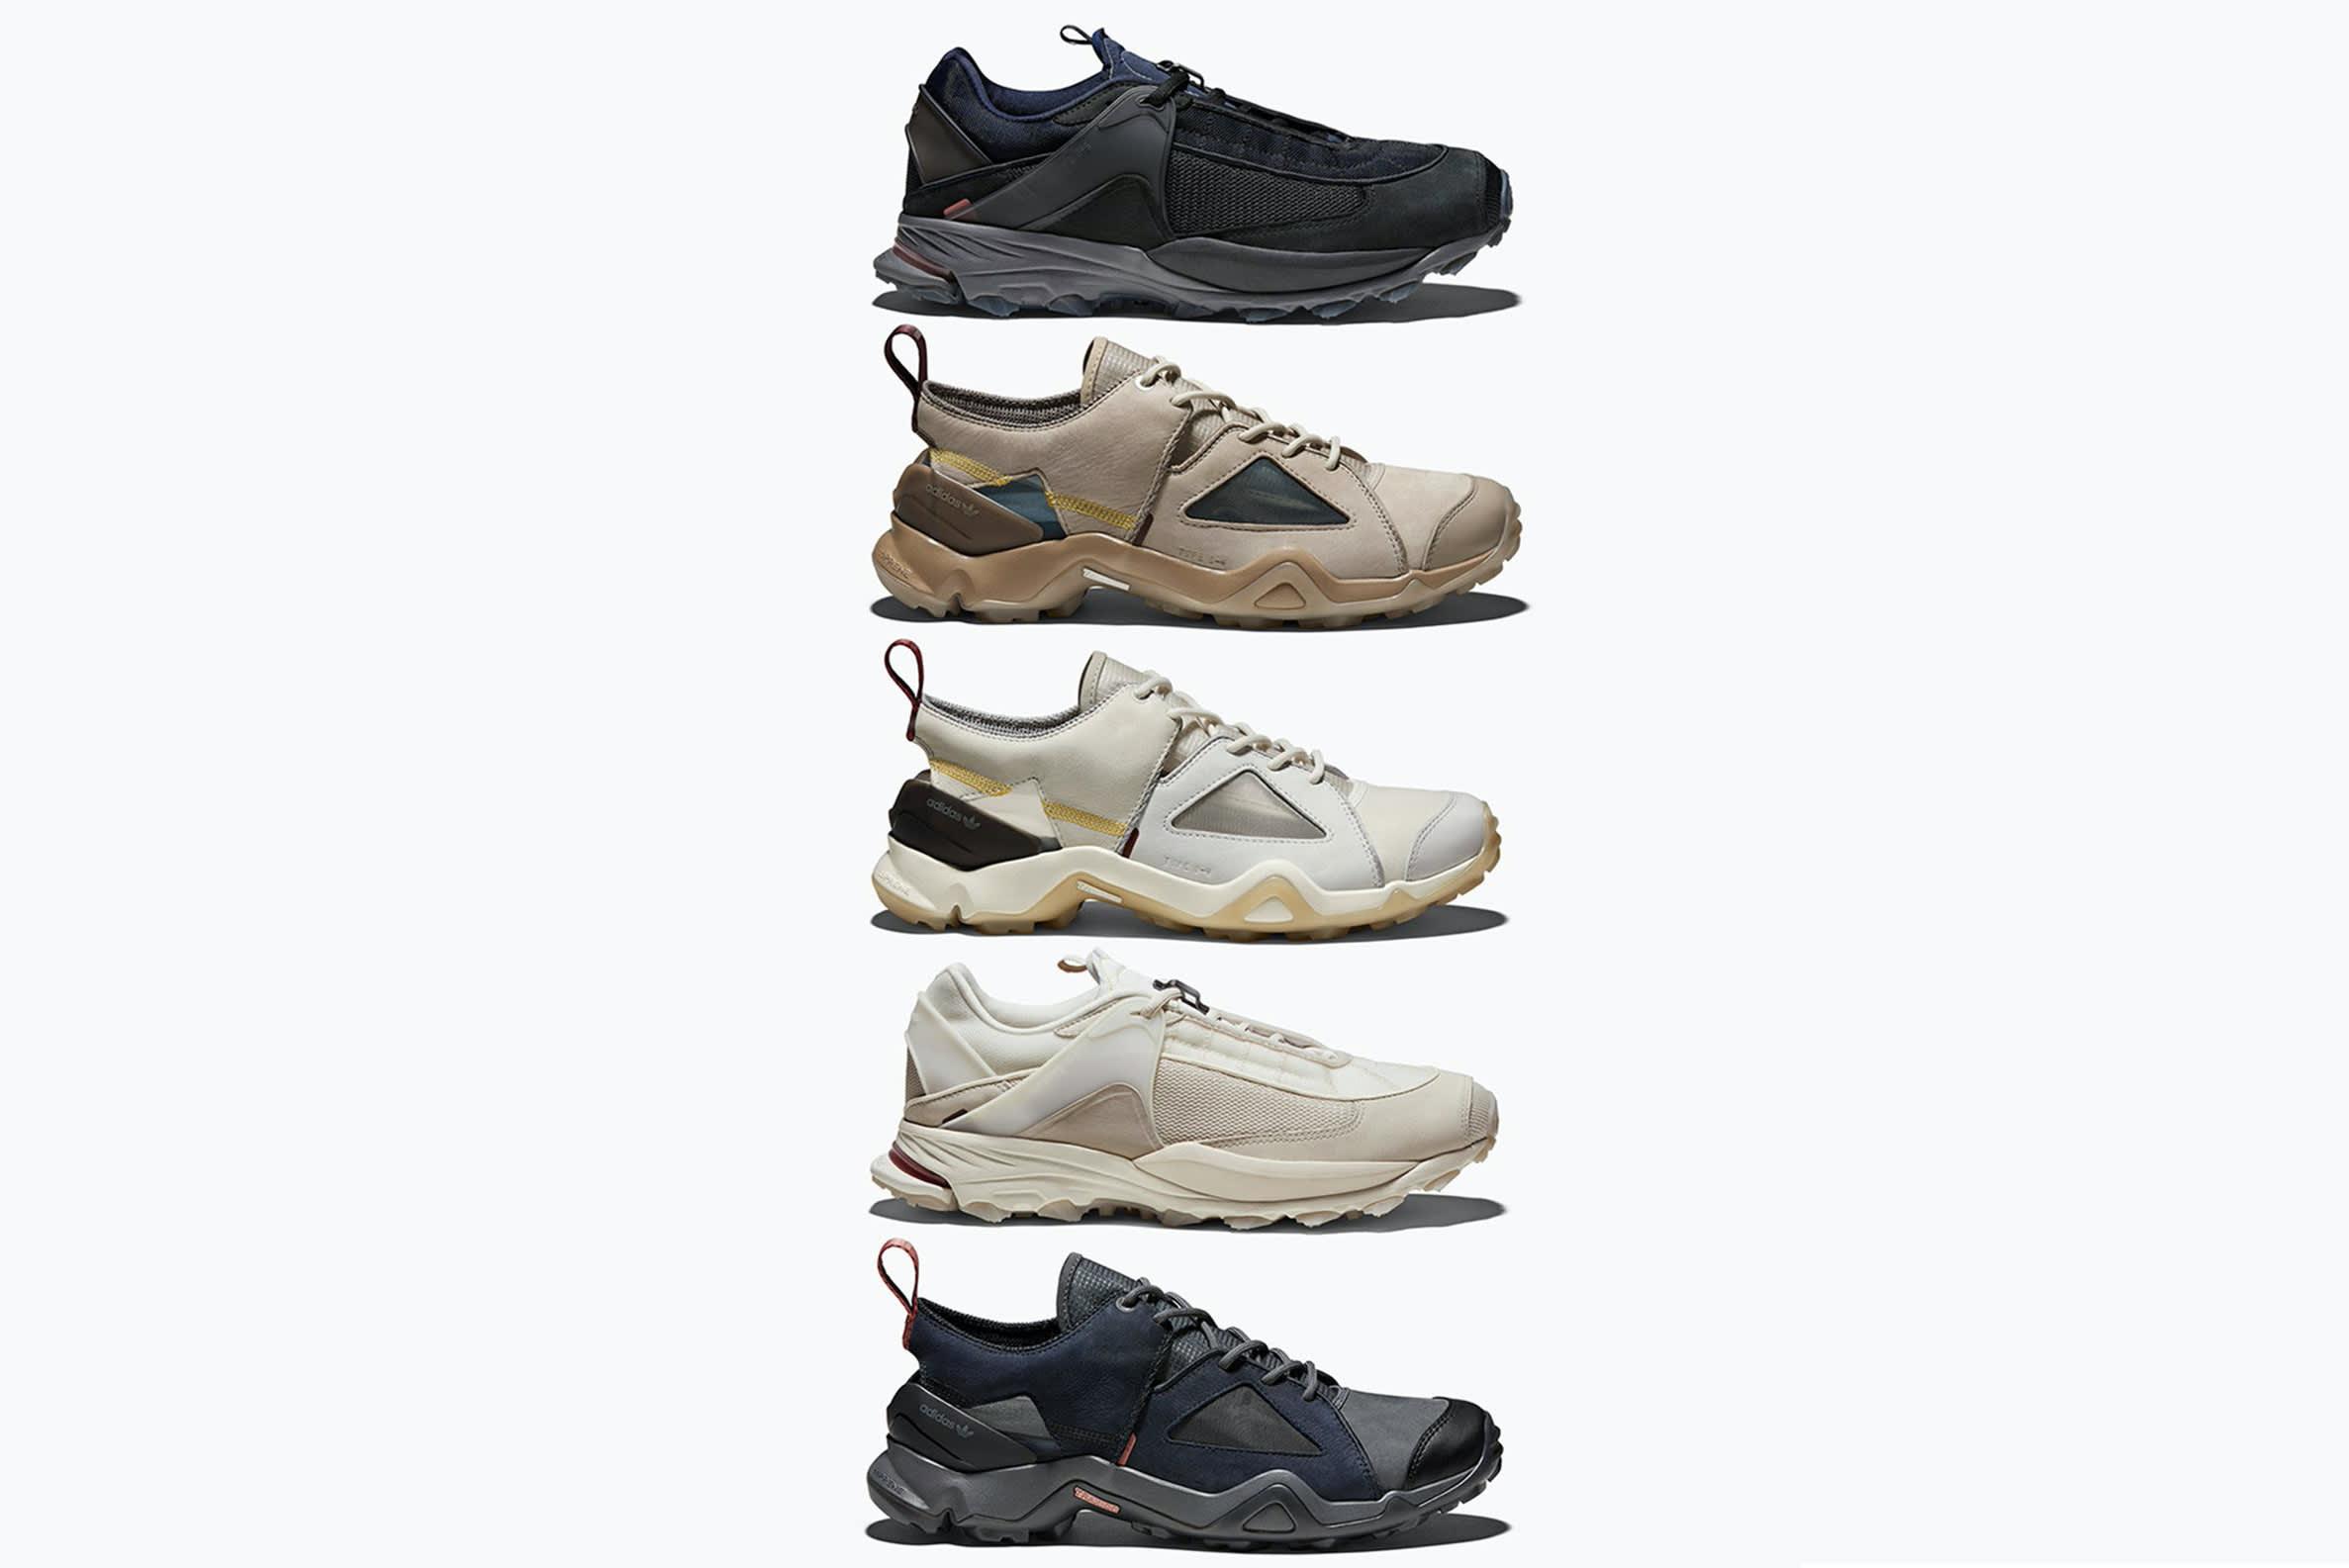 adidas x OAMC Type 0-4 & 0-5